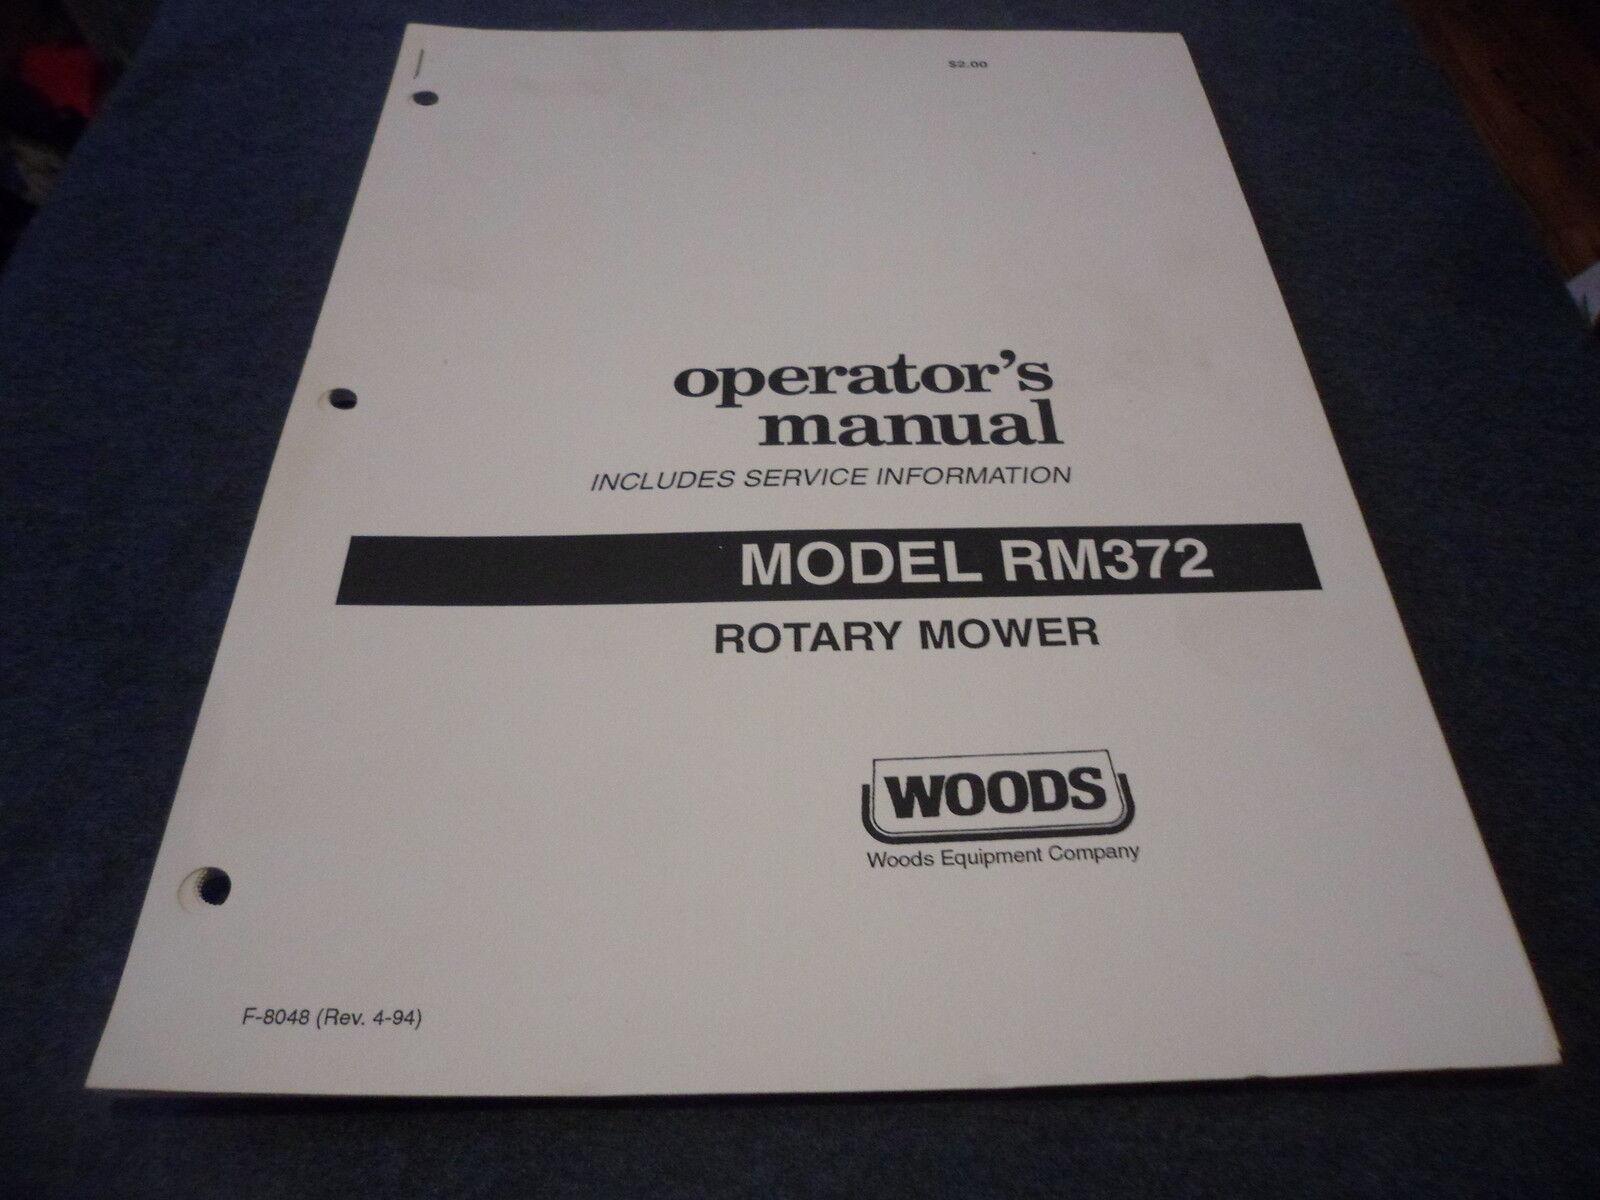 woods rm372 rotary mower owners manual service information ebay rh ebay com Equipment Maintenance Manual Equipment Manual Joke